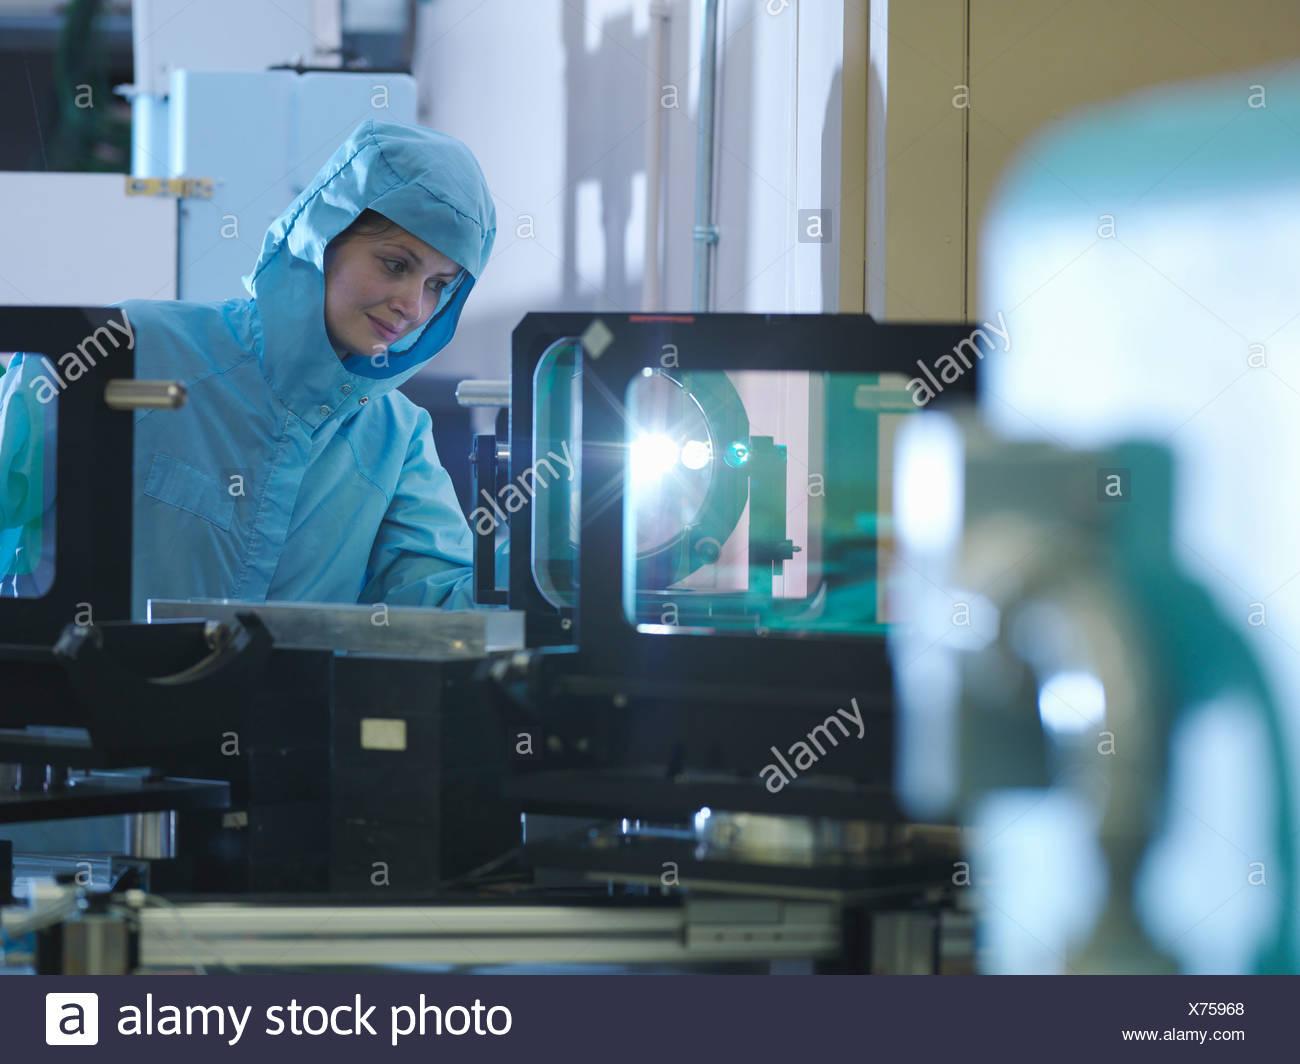 Scientist checking laser filter - Stock Image